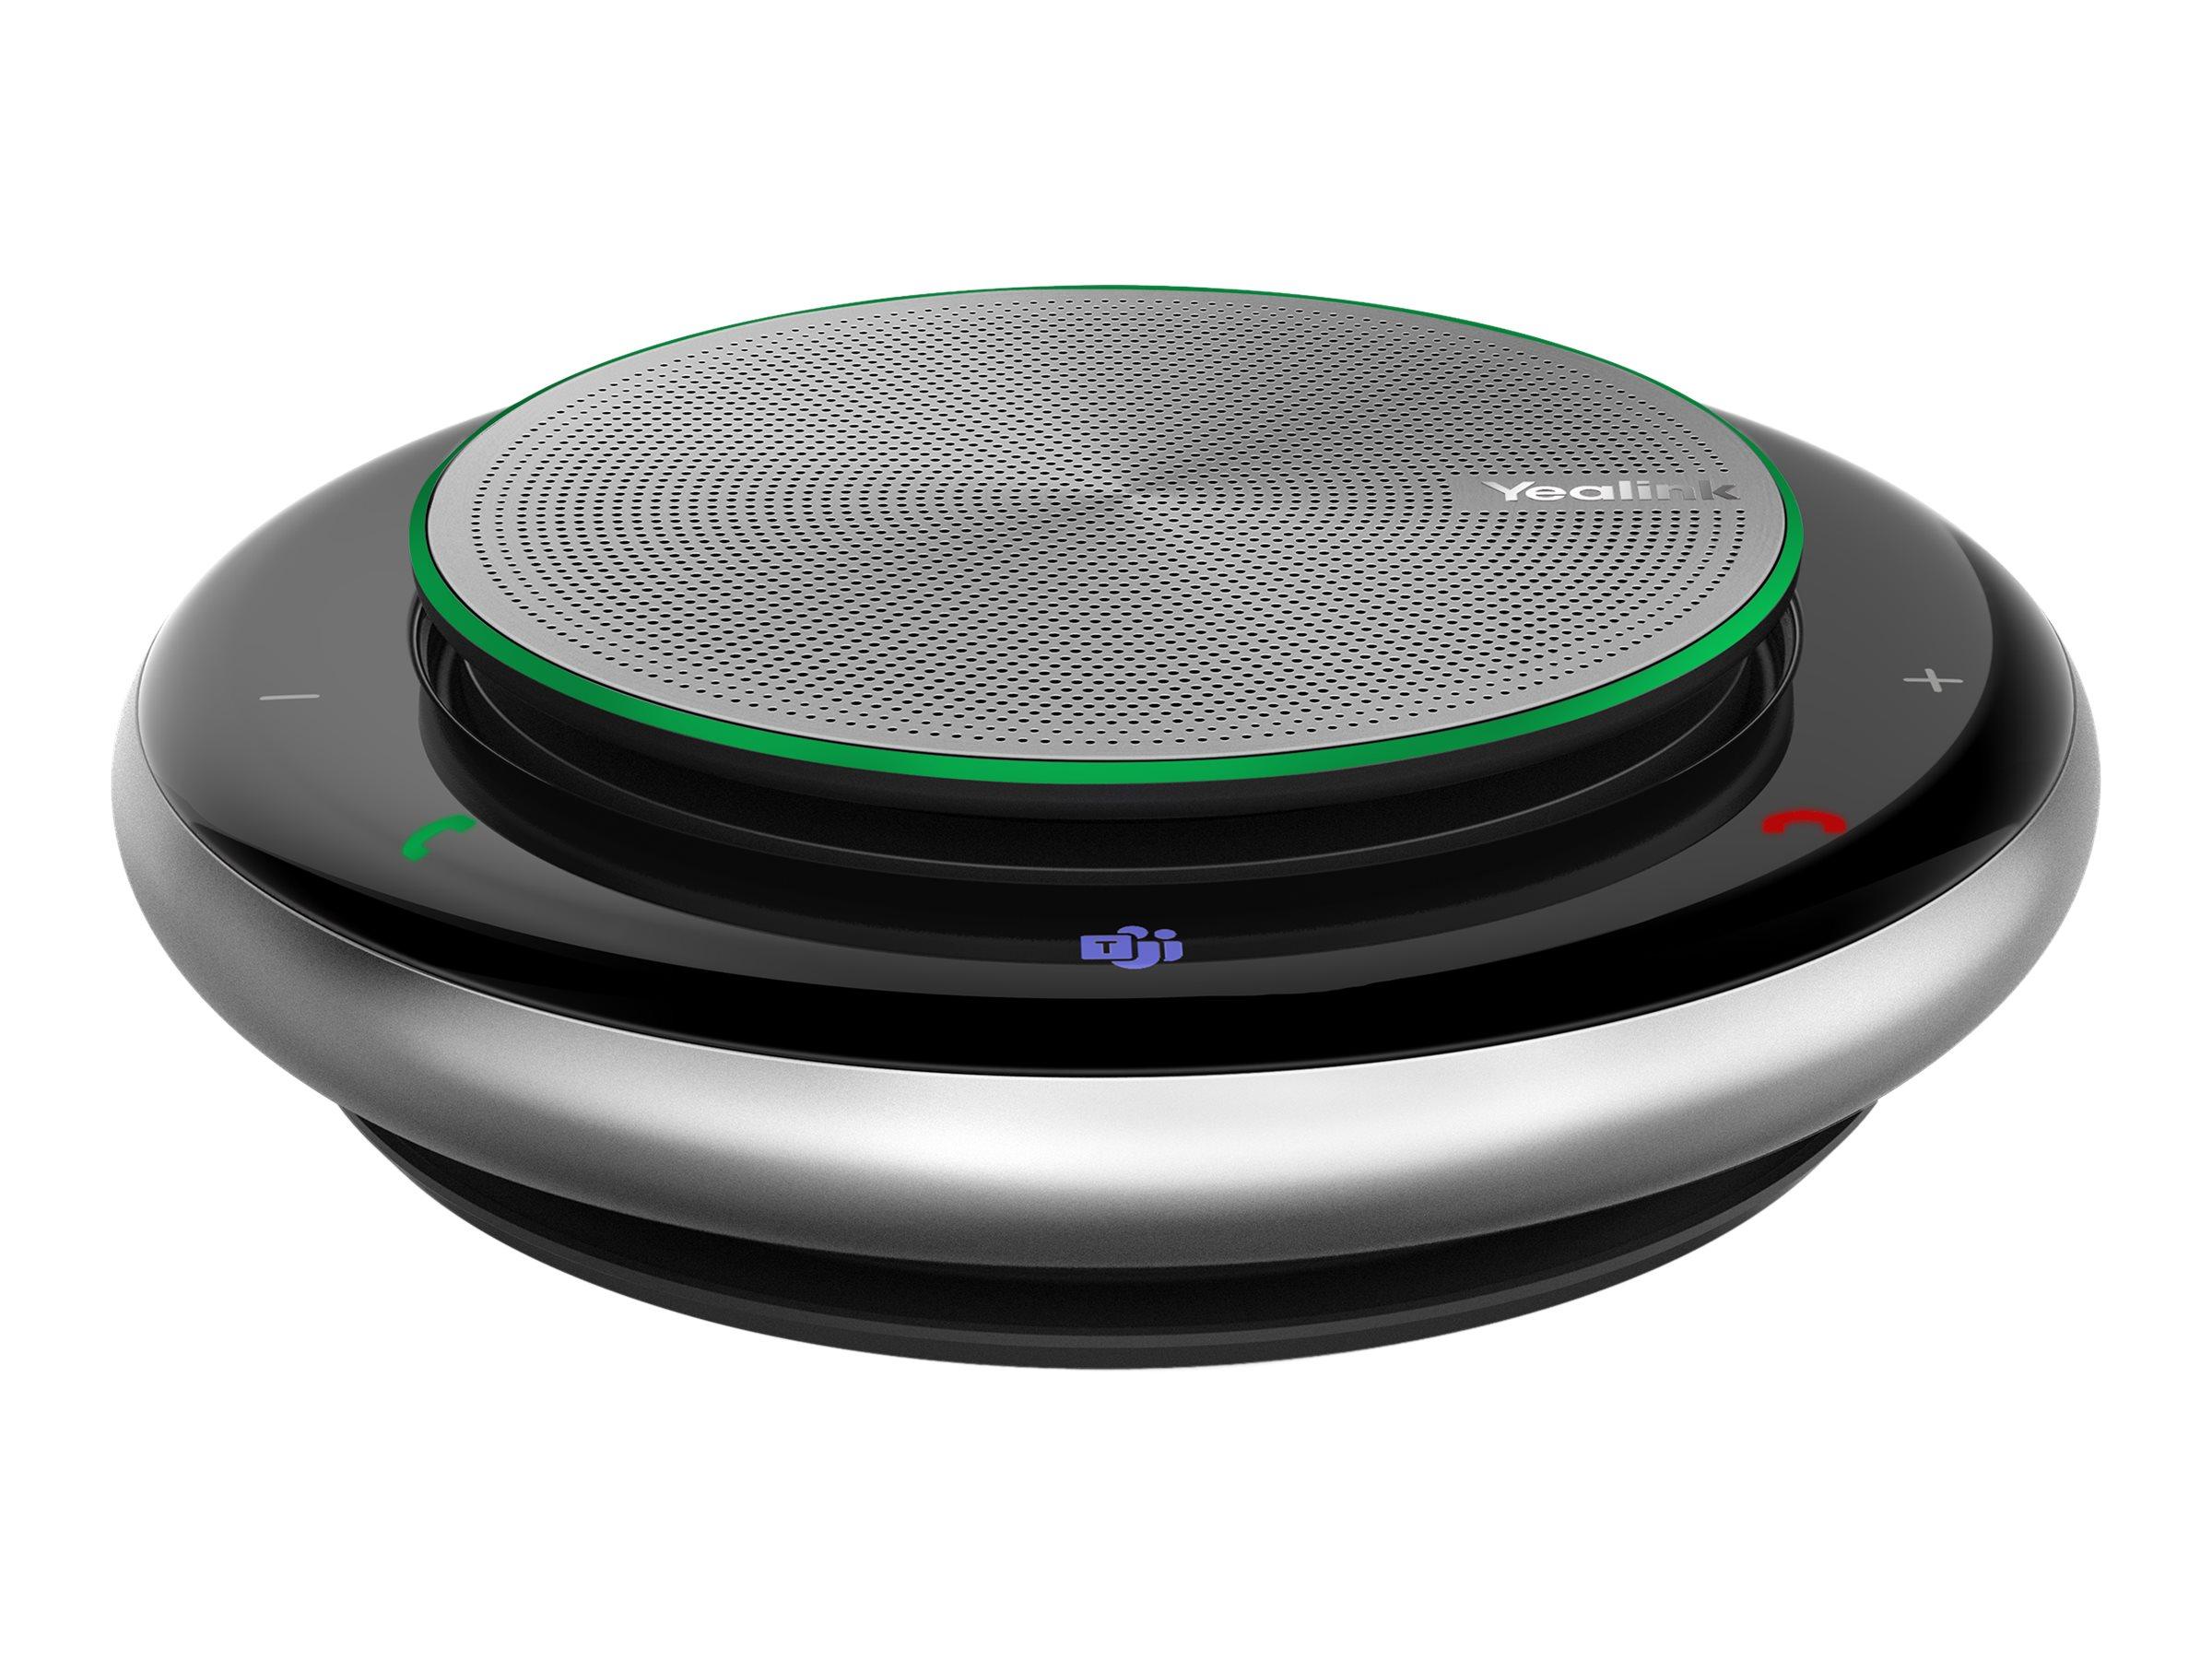 Yealink CP900 - Freisprechtelefon - Bluetooth - kabellos, kabelgebunden - USB